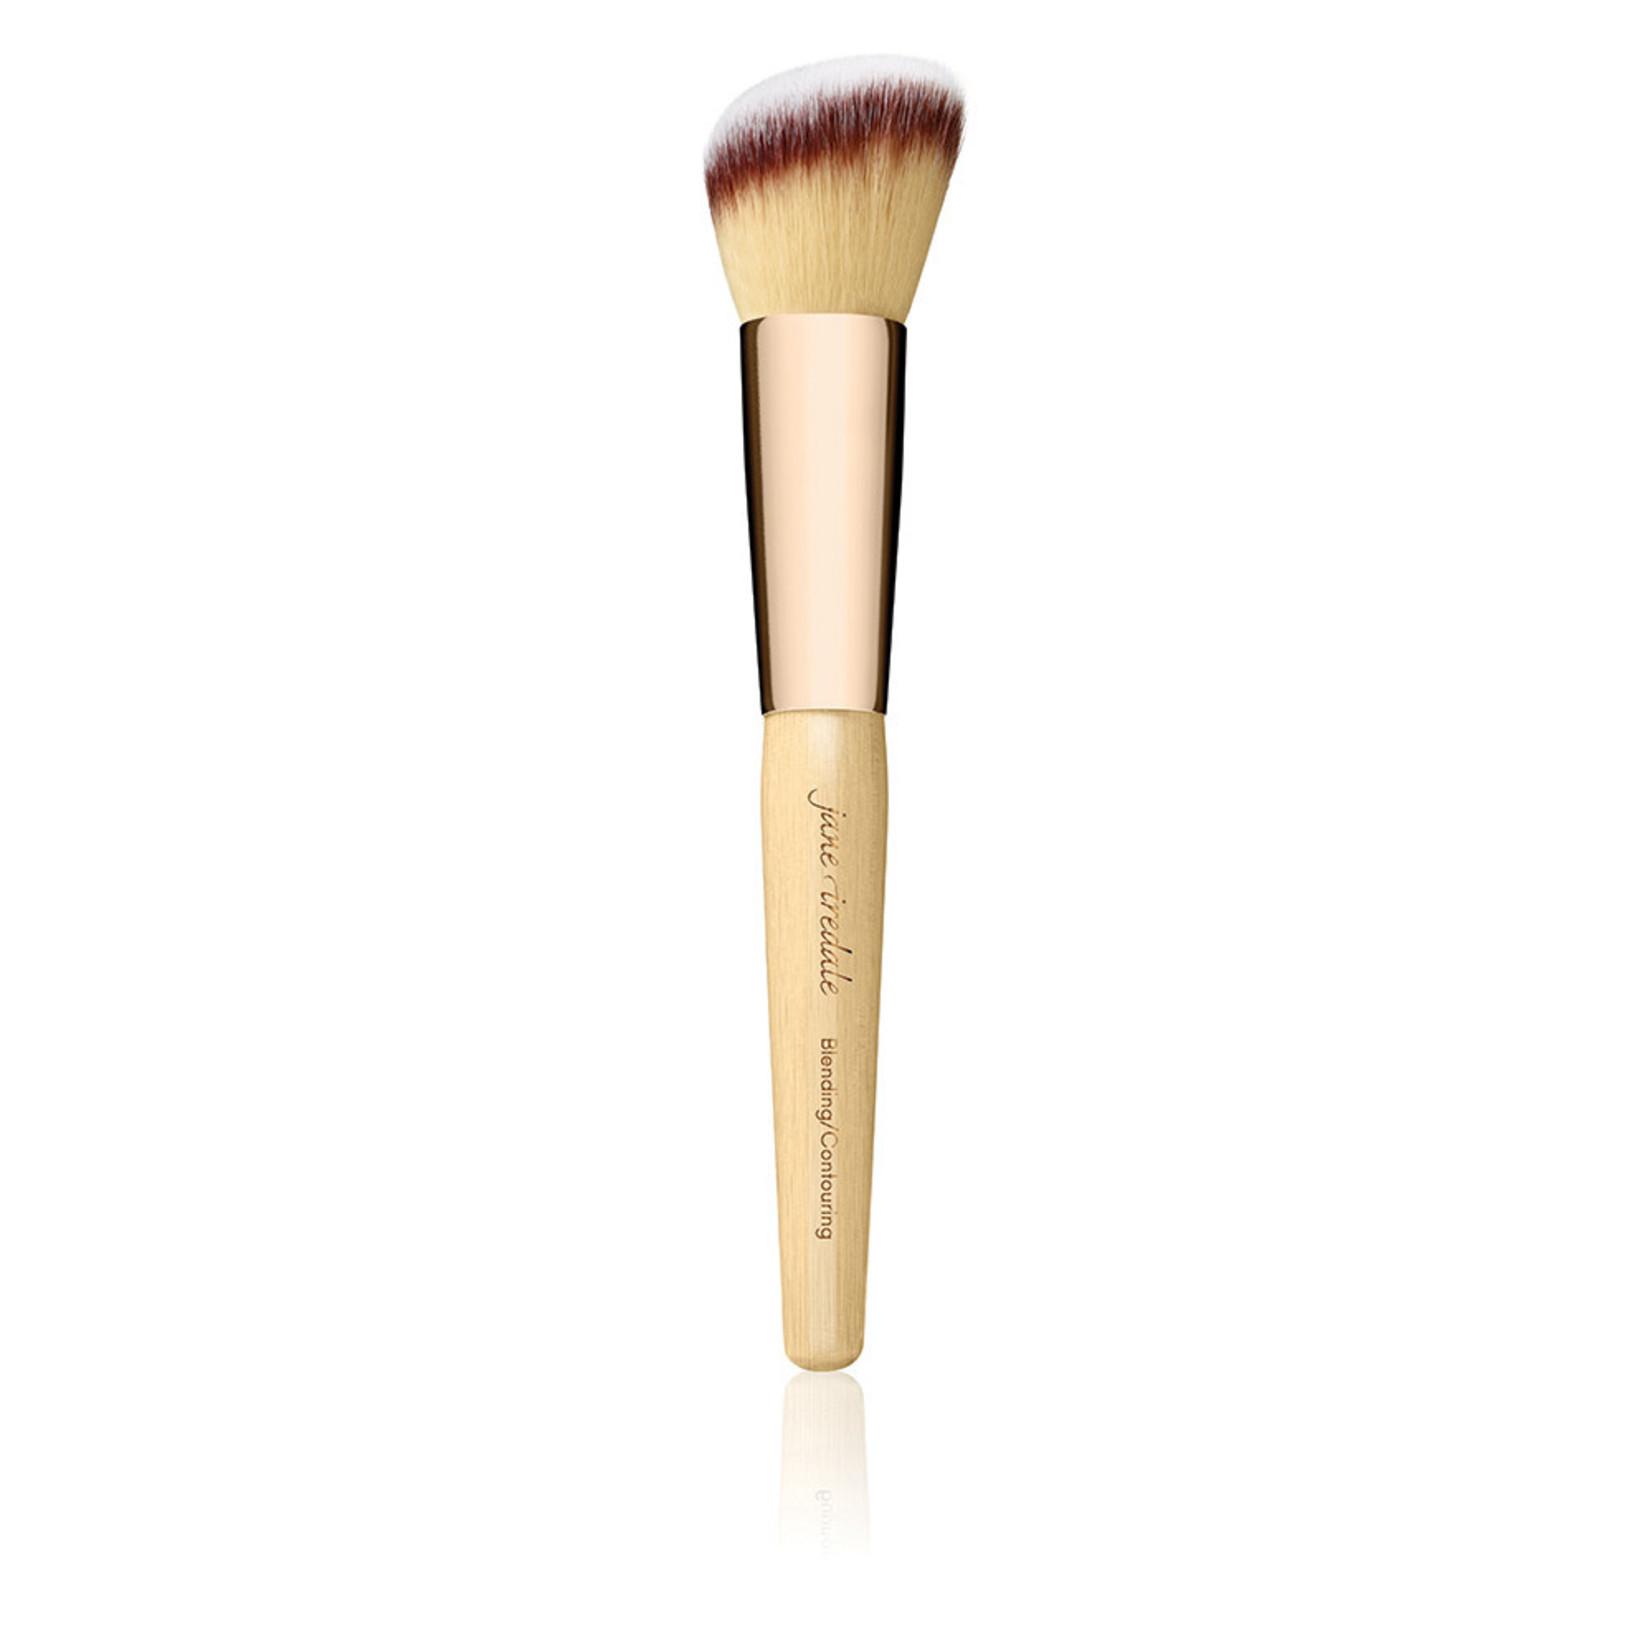 Blending/contour brush